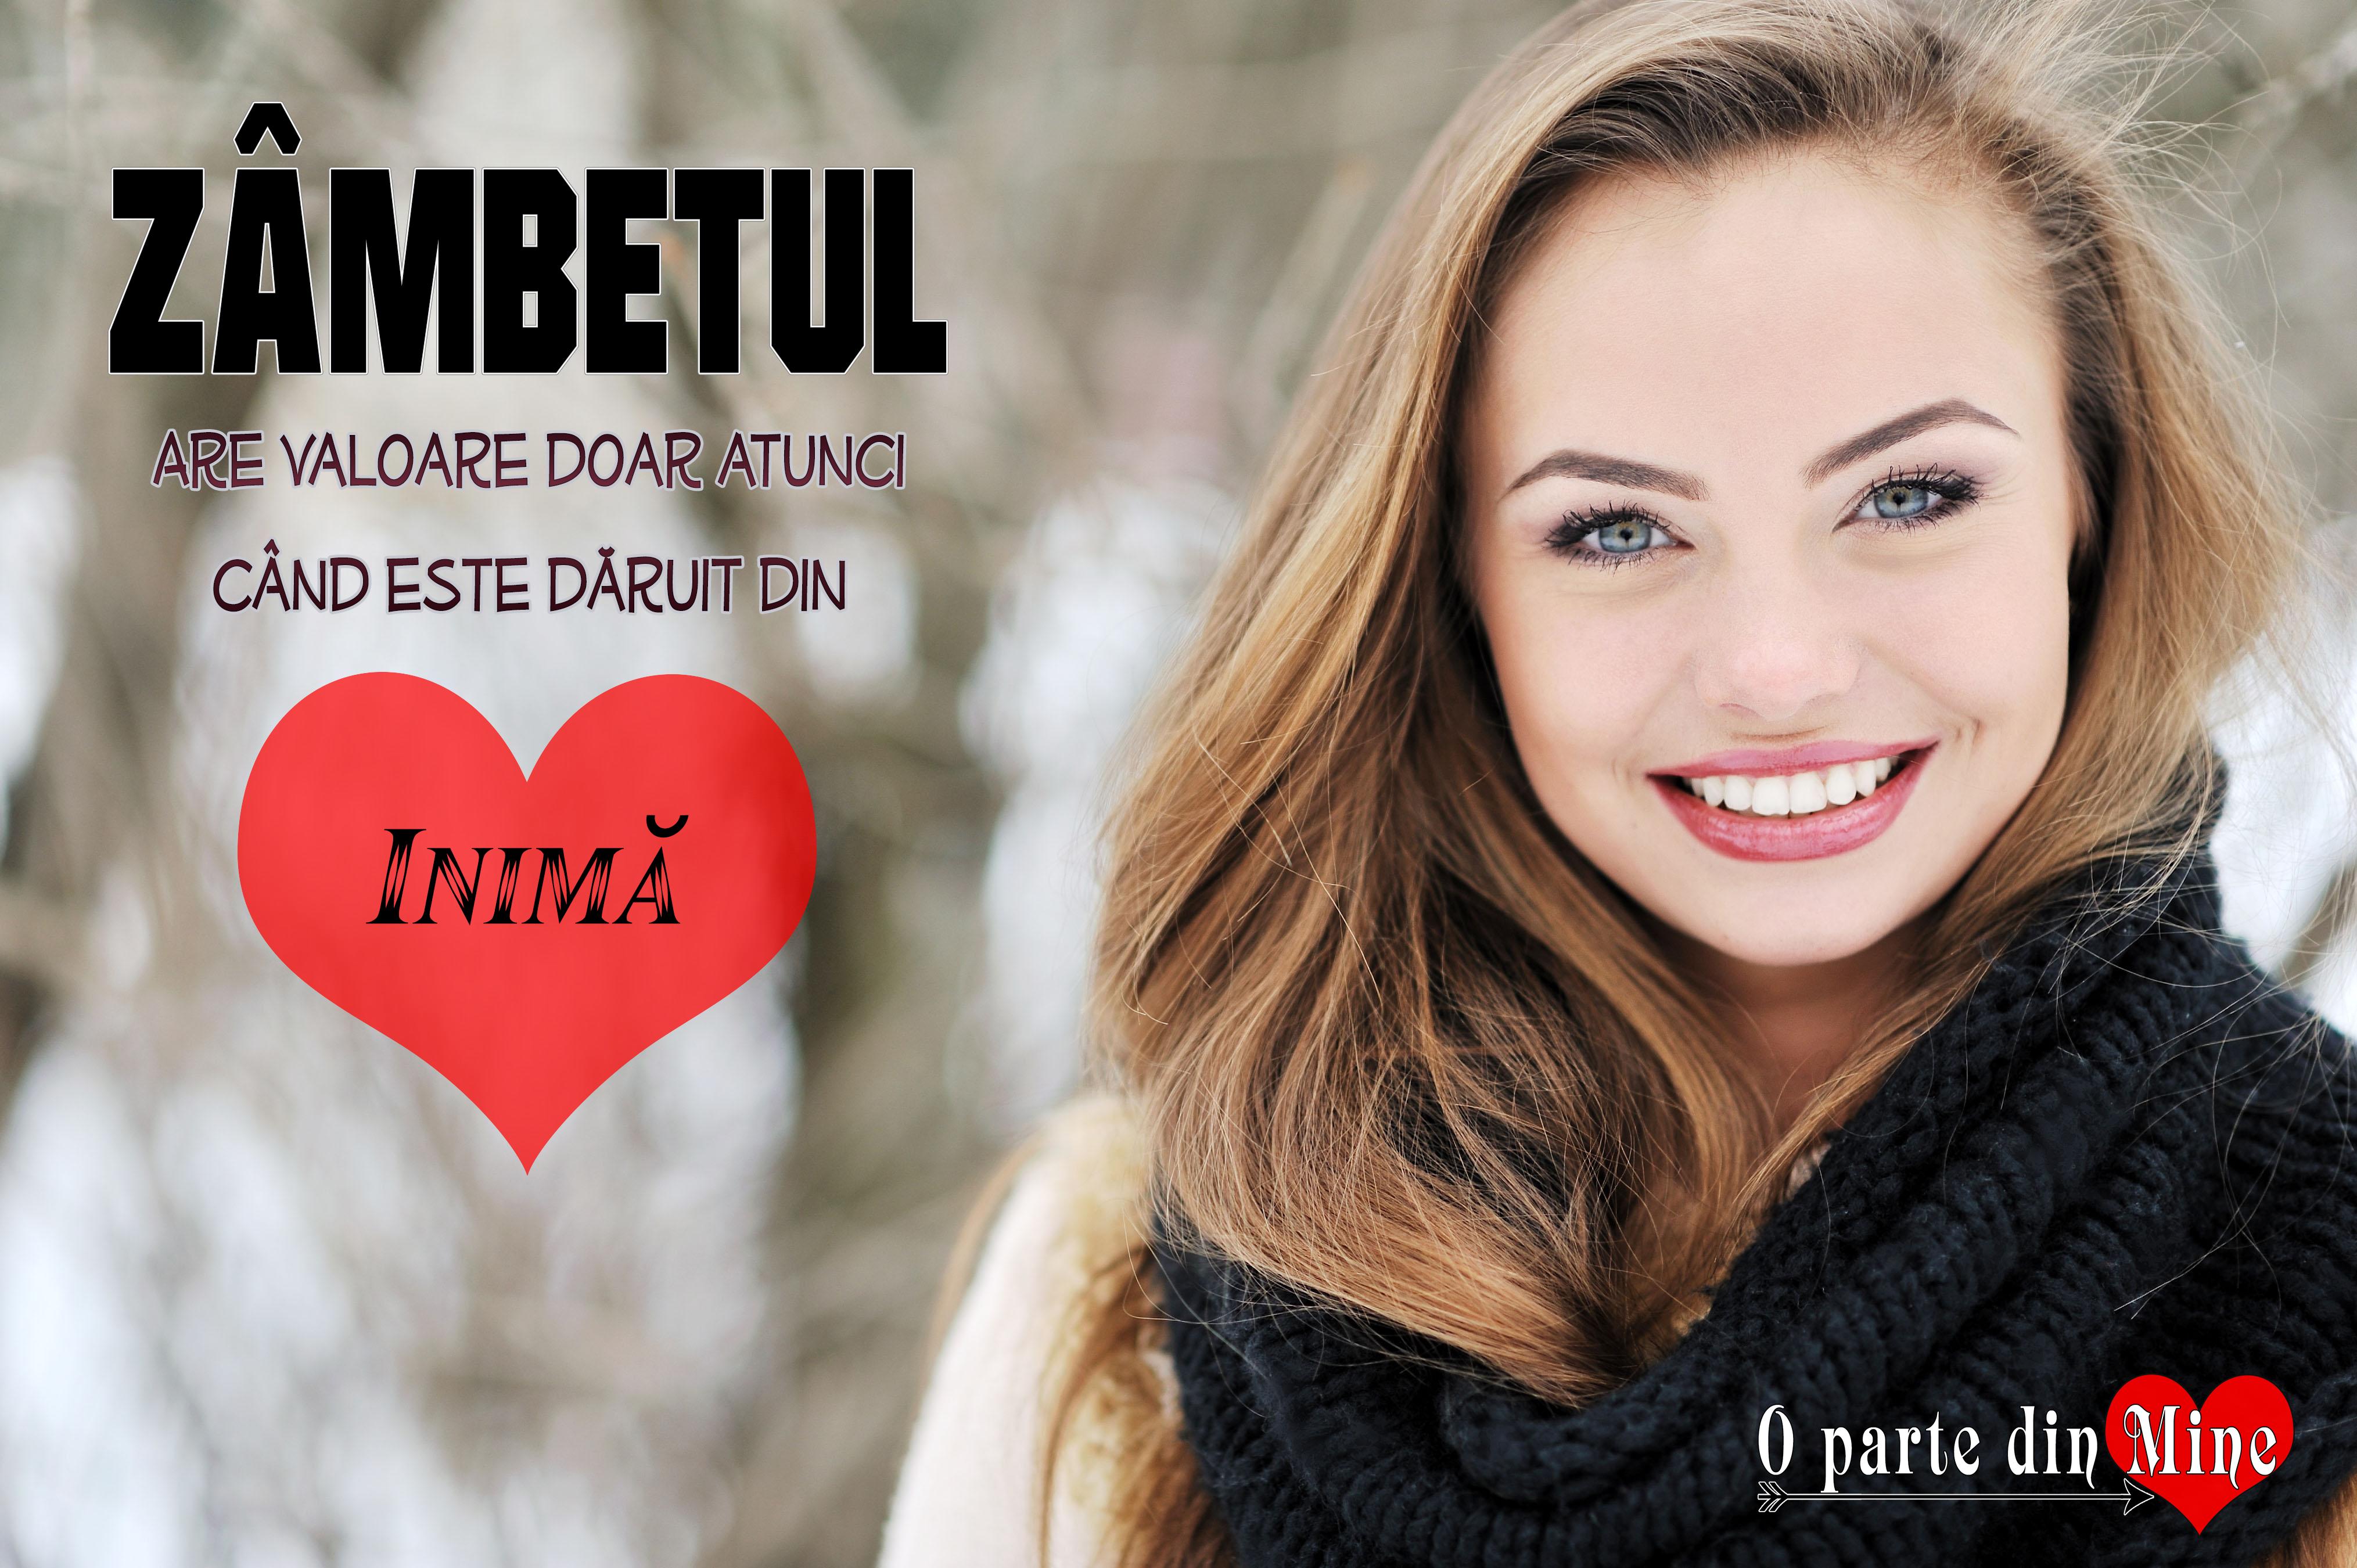 citate despre fericire si zambet Zâmbet | O parte din Mine citate despre fericire si zambet